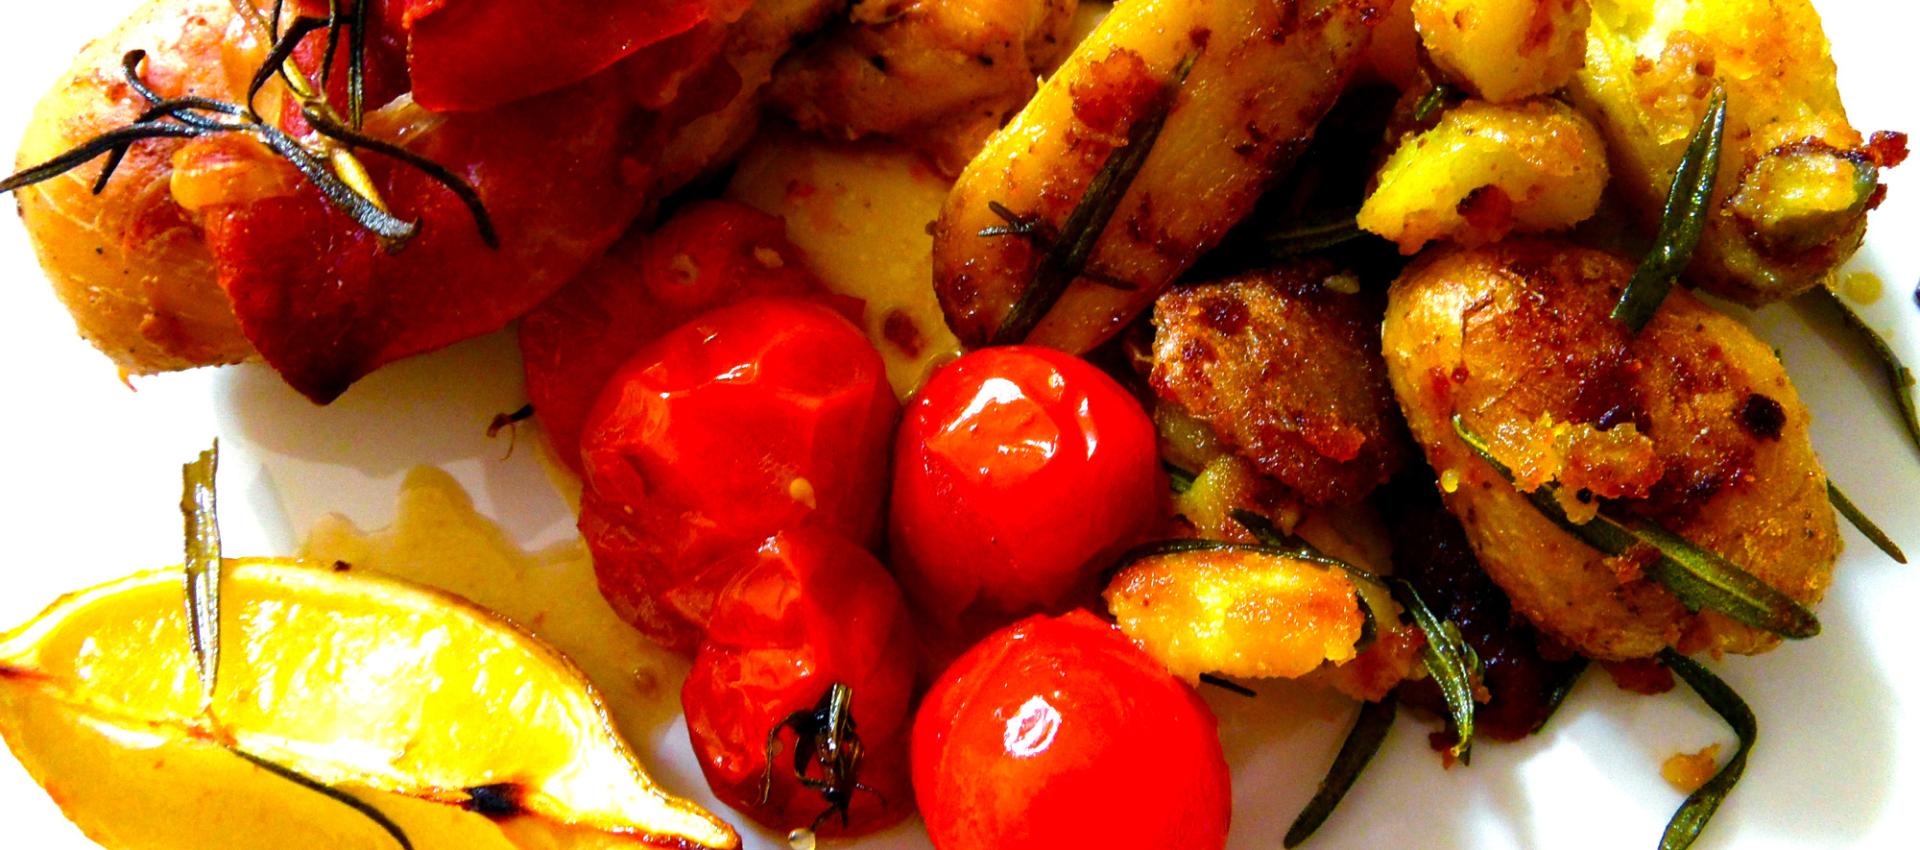 Rezept Zitronenhähnchen mit Rosmarinkartoffeln - Kochbock.de